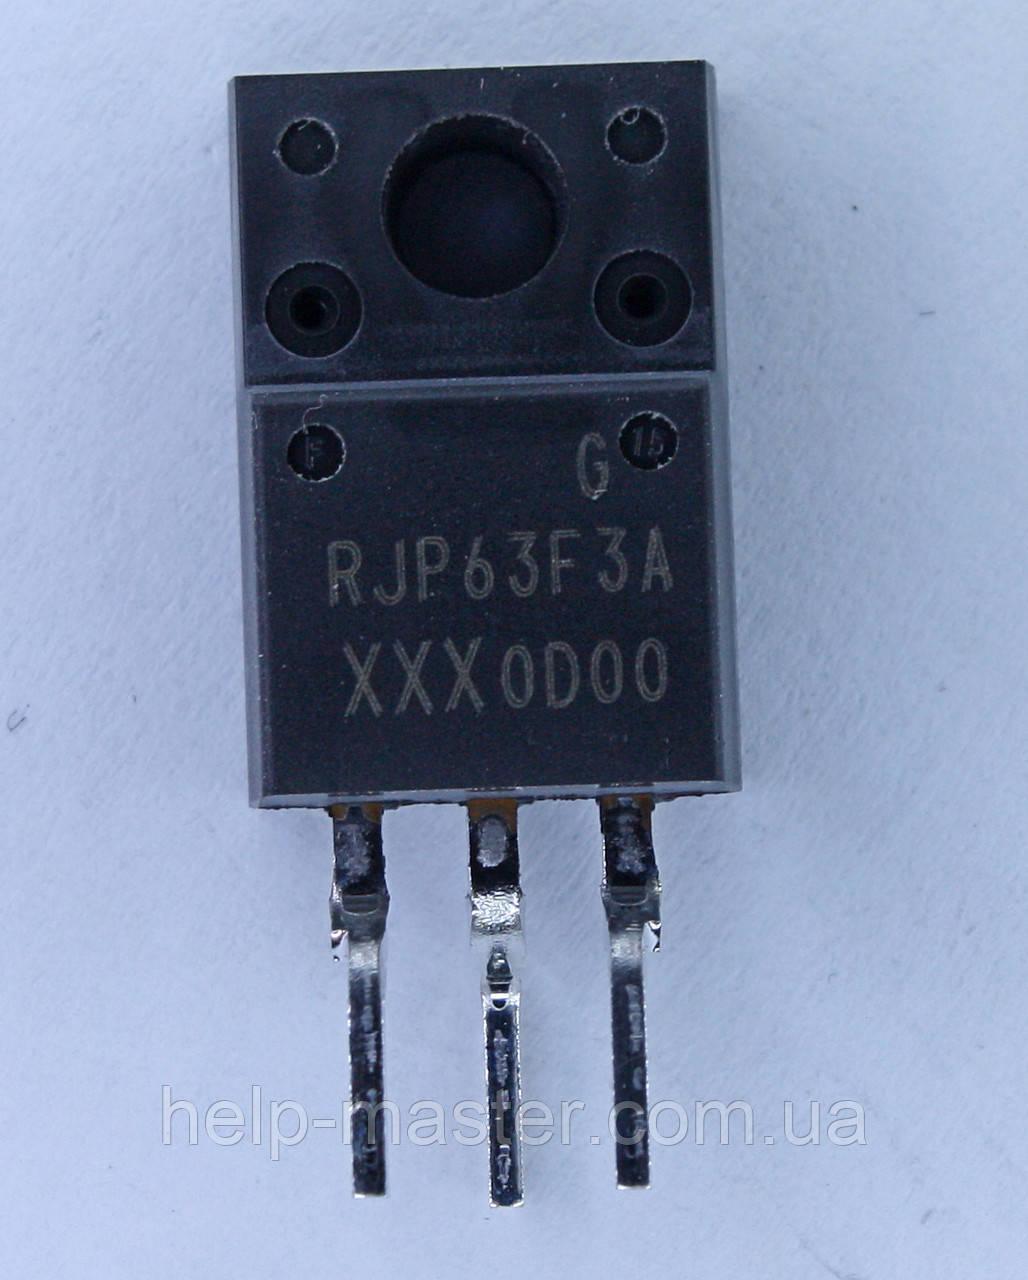 Транзистор RJP63F3A (TO-220FP)